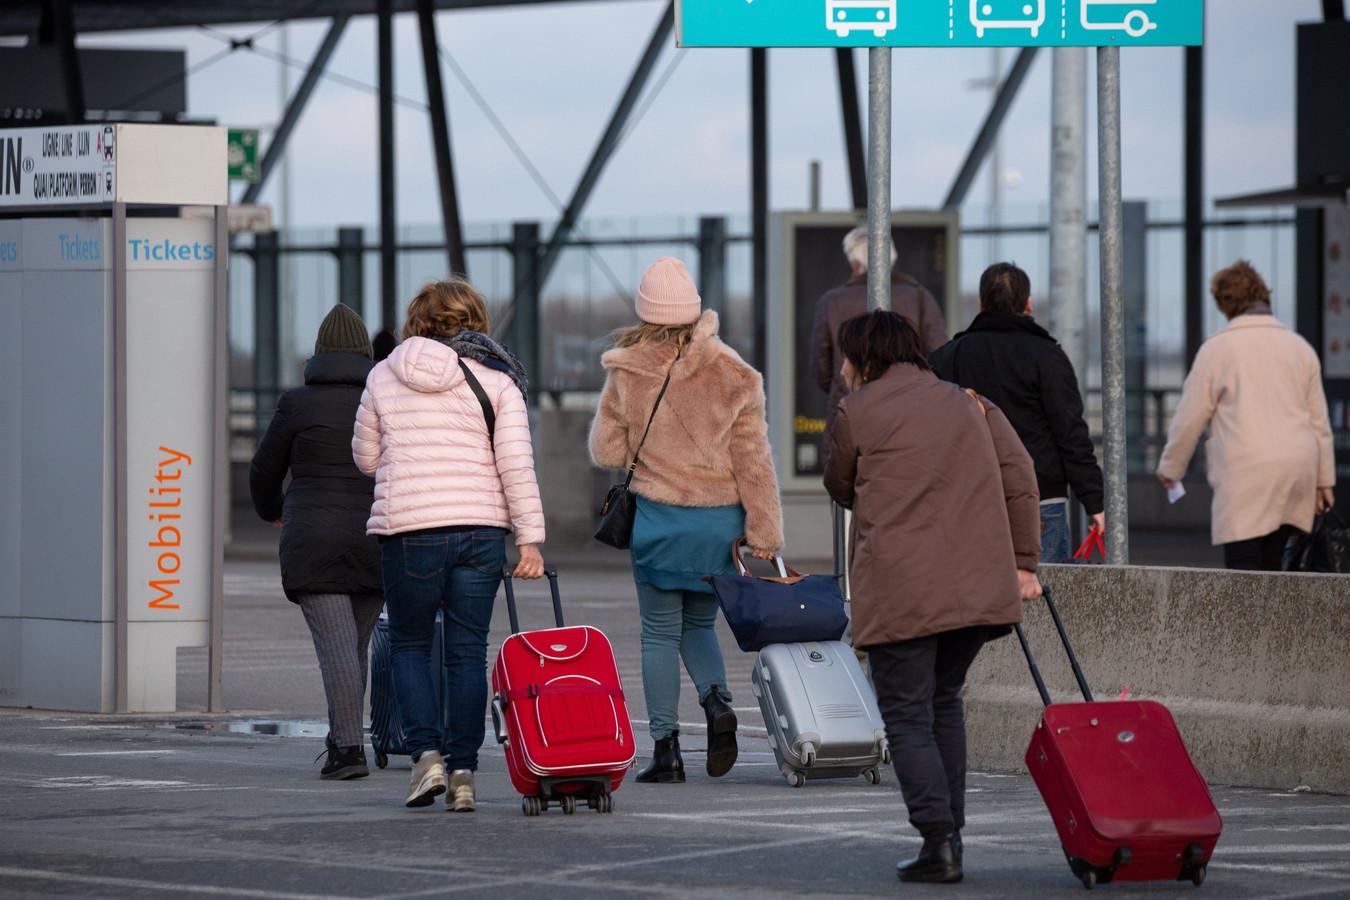 Entrée de l'aéroport de Charleroi (2019)      PICTURE NOT INCLUDED IN THE CONTRACT.  ! Only BELGIUM !